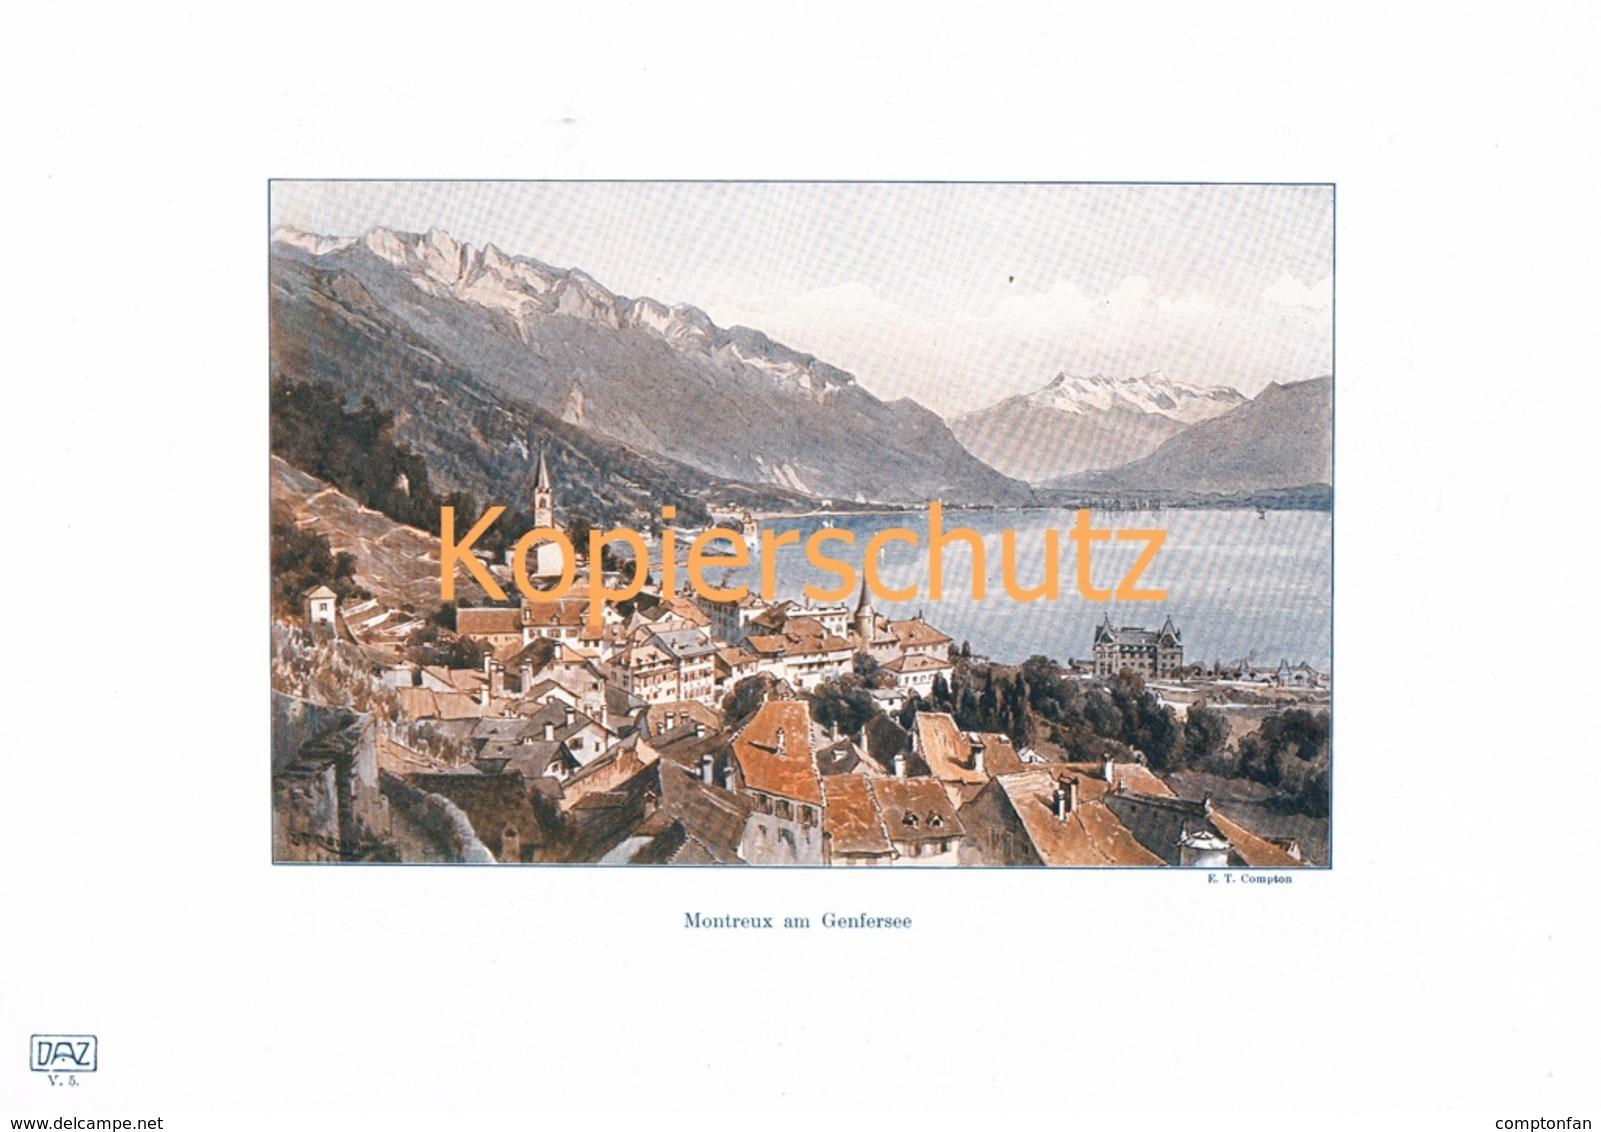 109-2 E.T.Compton Montreux Genfersee Farbdruck Kunslatt 1905 !!! - Decretos & Leyes